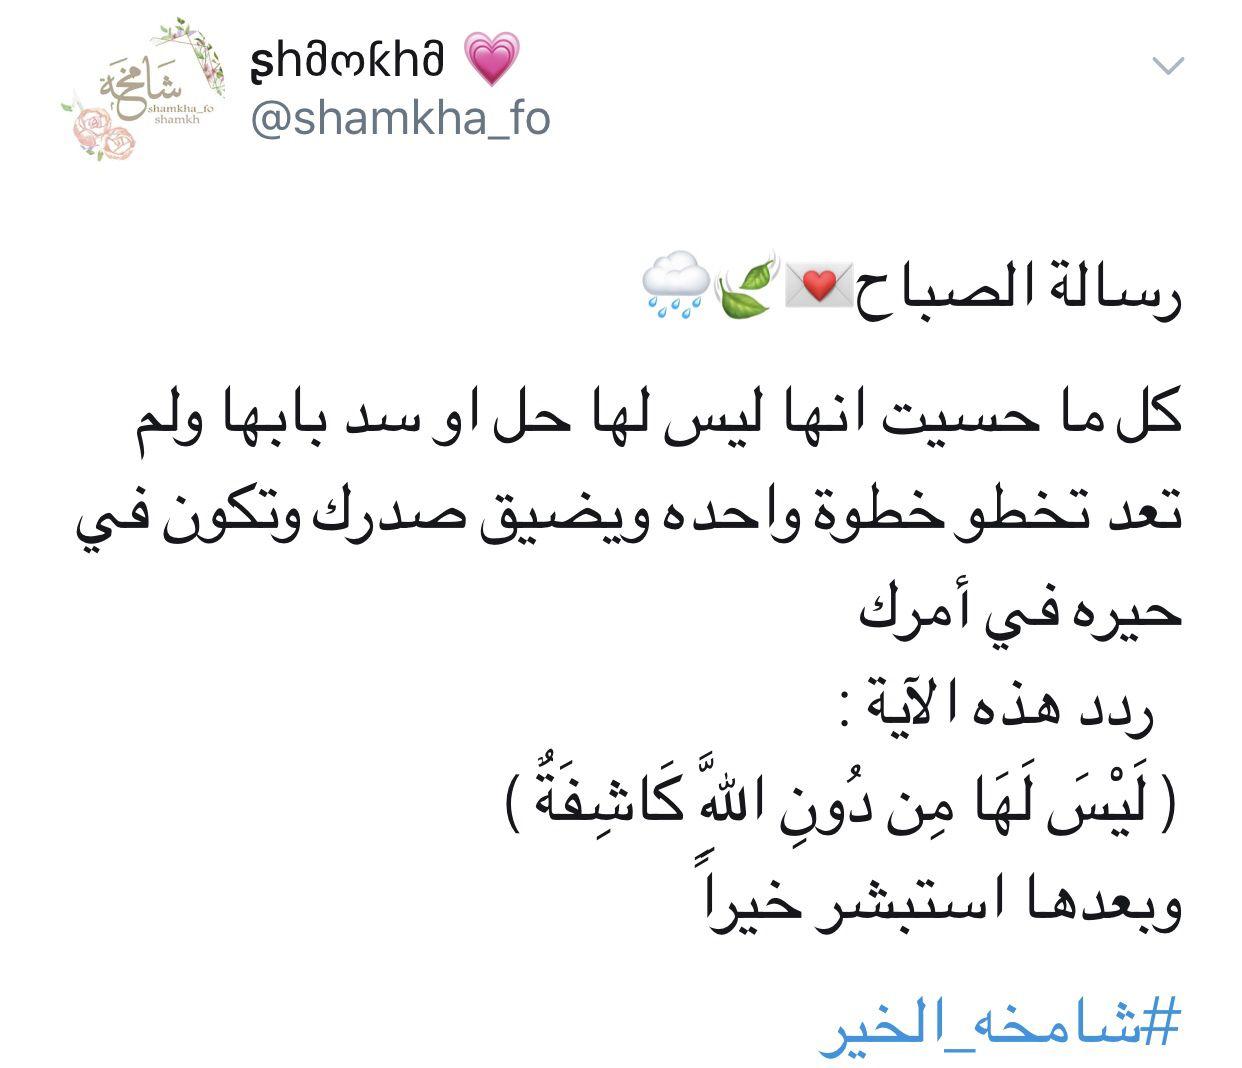 Pin By Lubana Bader On نحو الايجابيه نمضي Islamic Love Quotes Quran Quotes Love Islamic Phrases